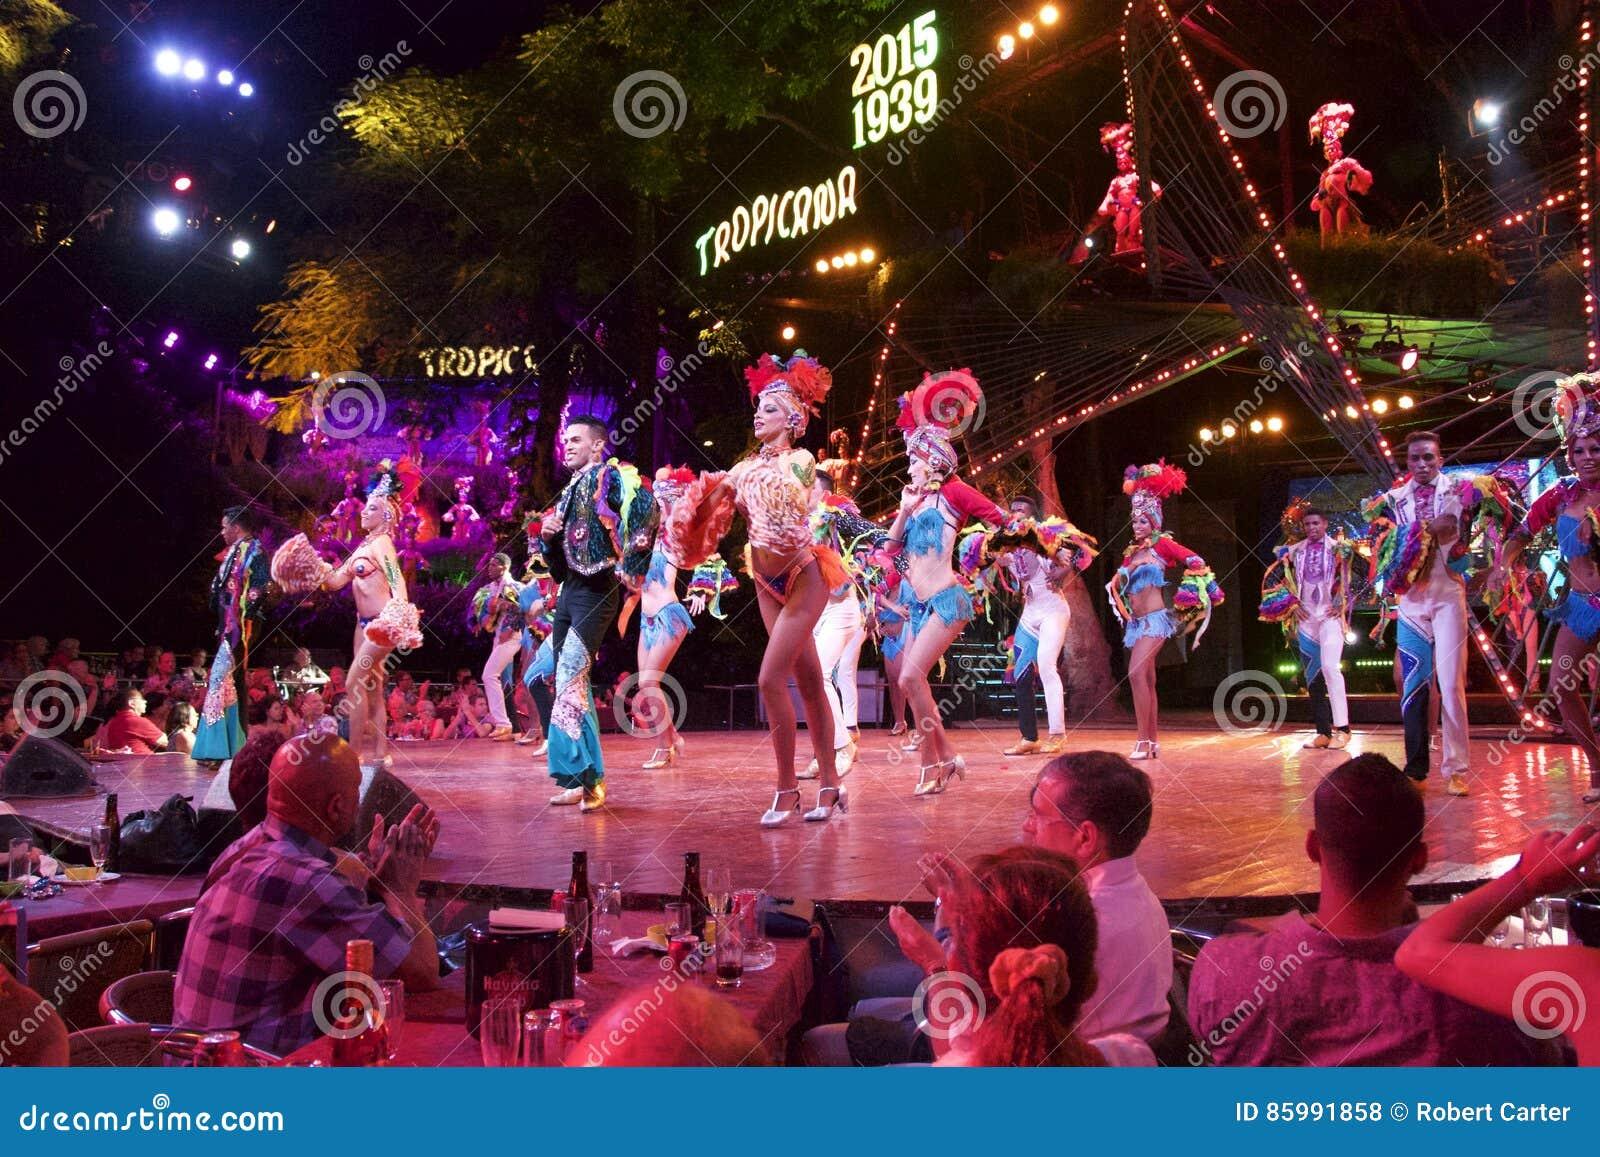 Havana Cuba Tropicana night club